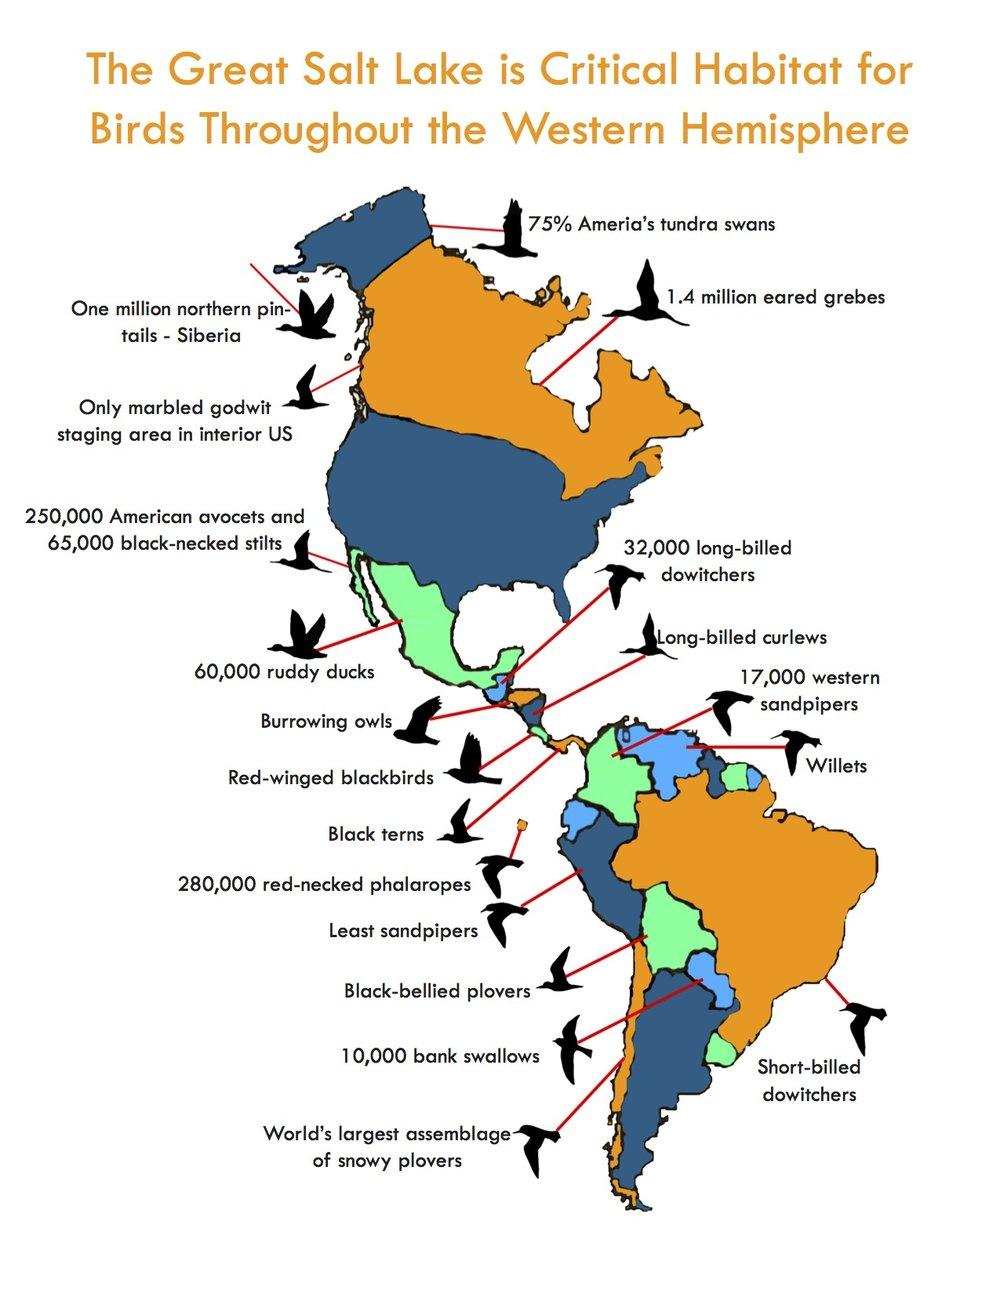 GSL-bird-map-with-text.jpg